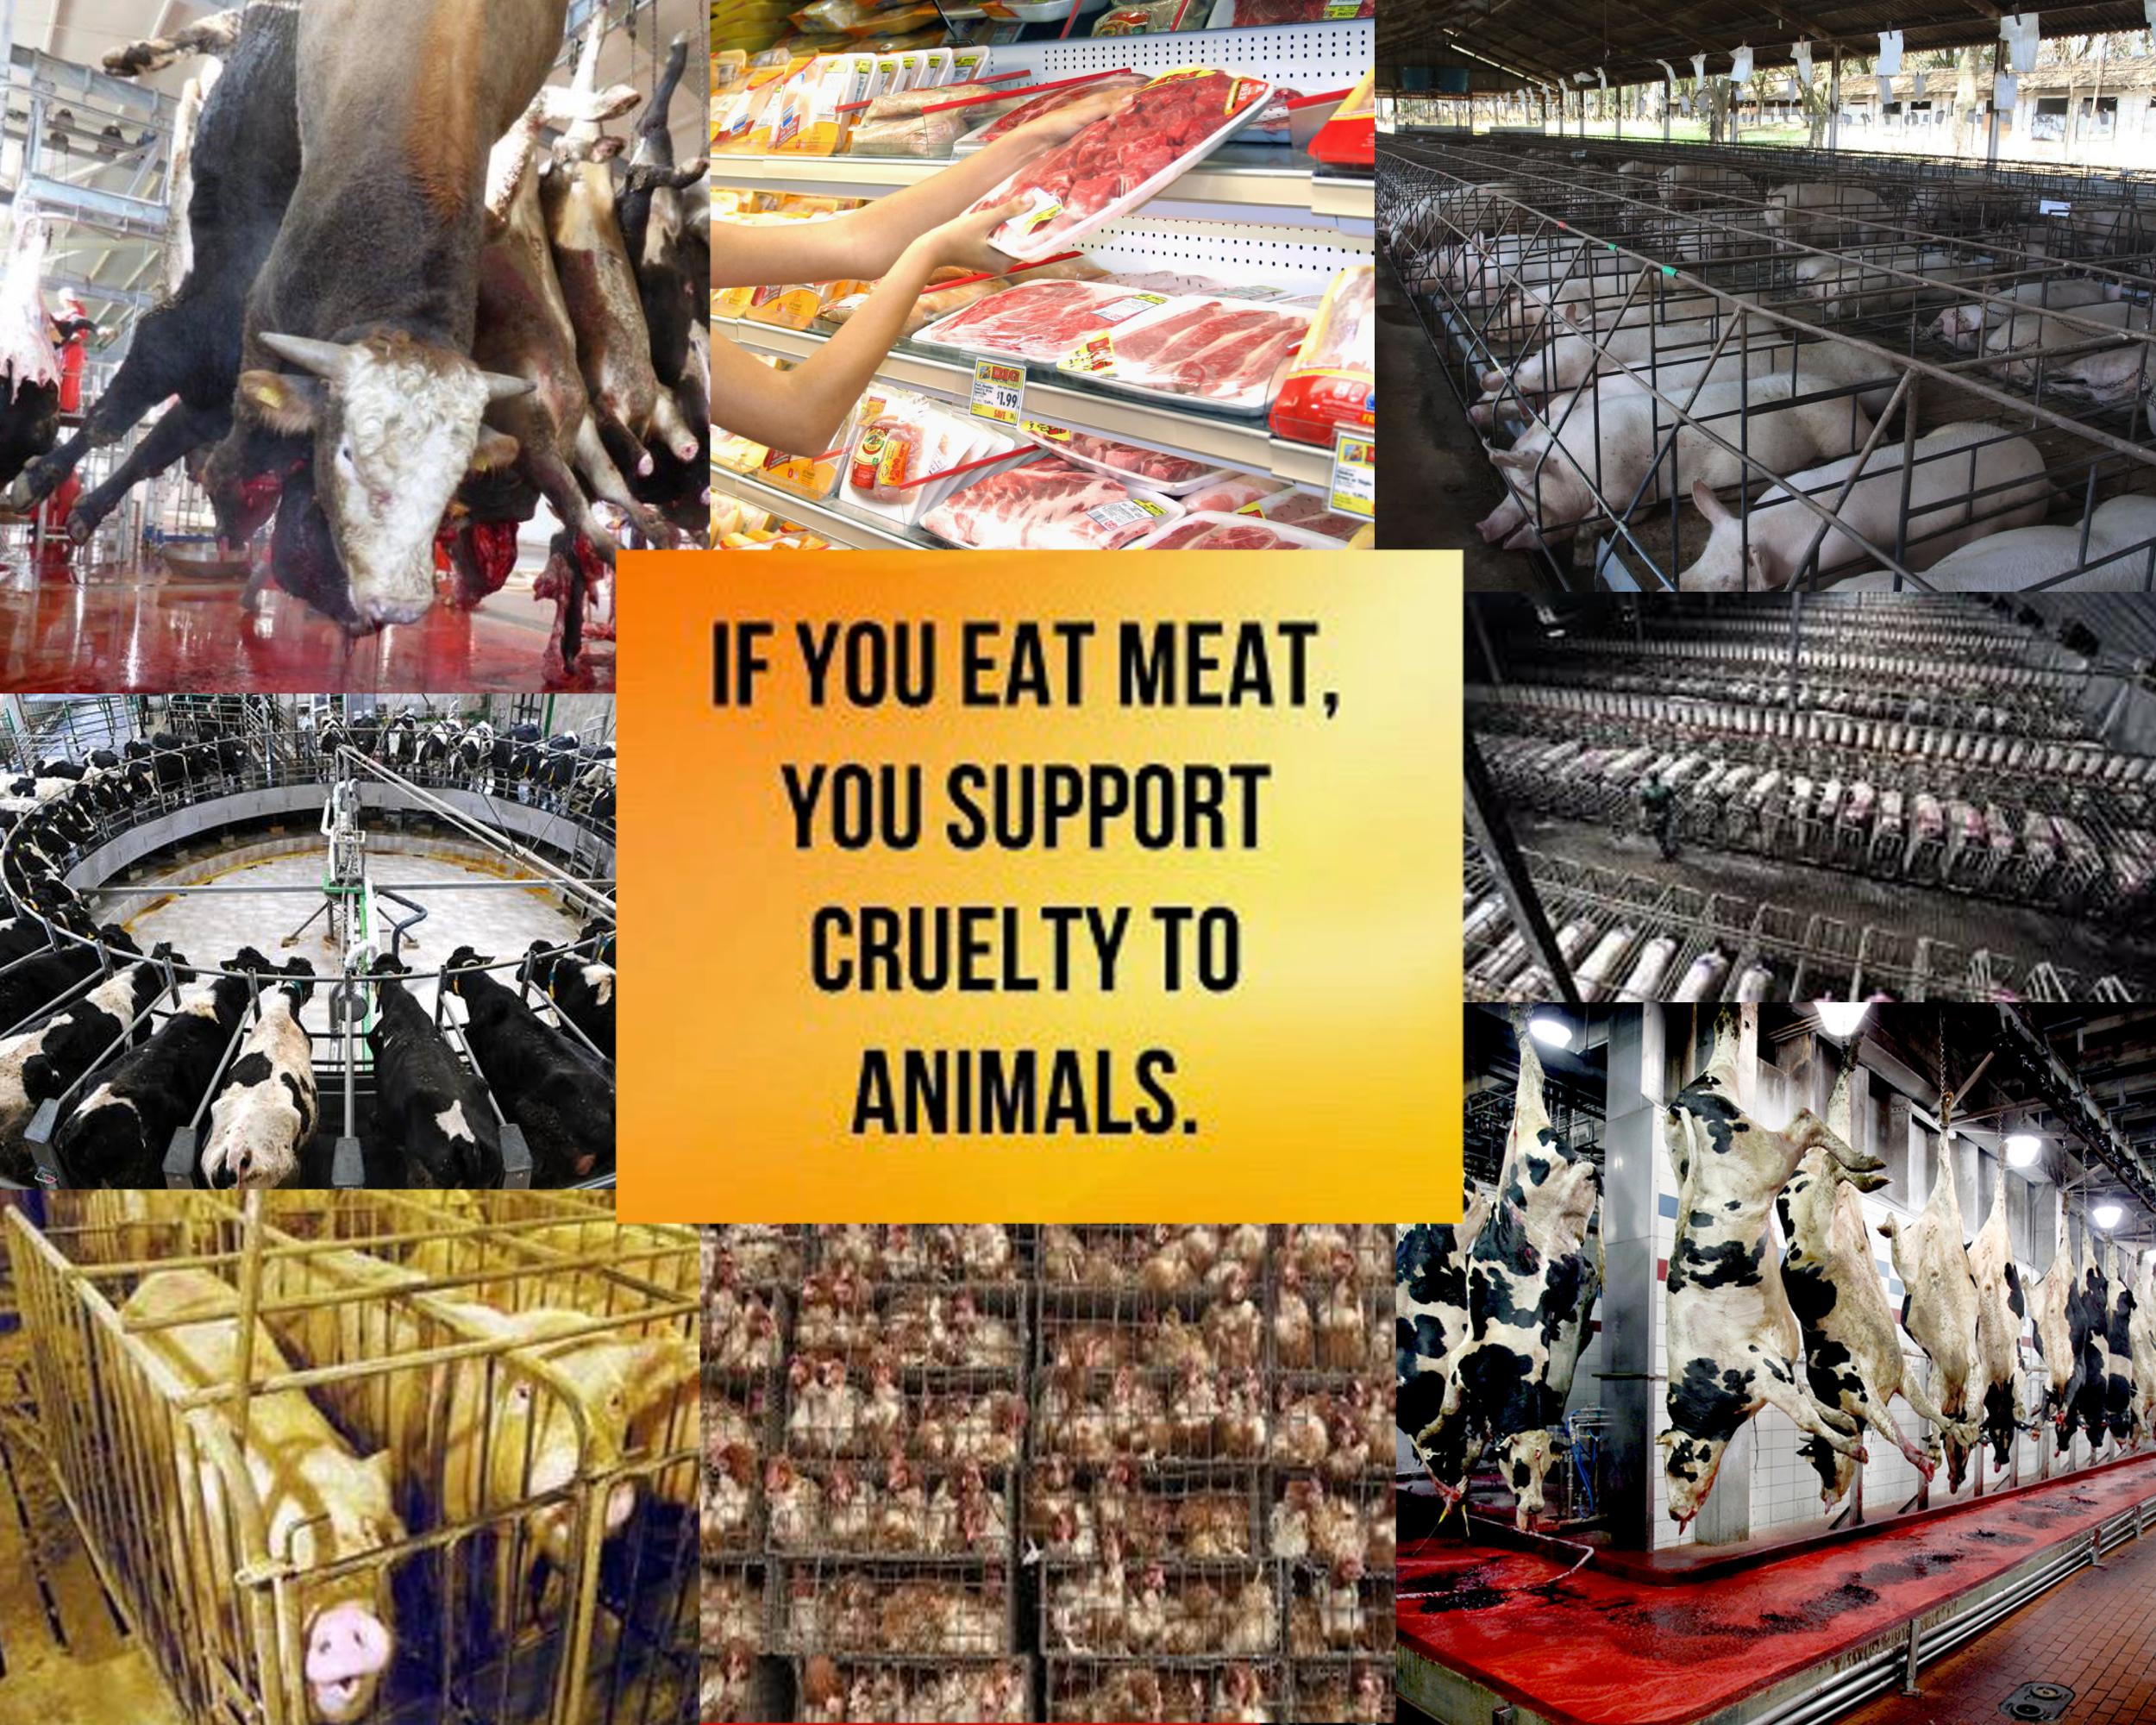 Cruelty_to_animals